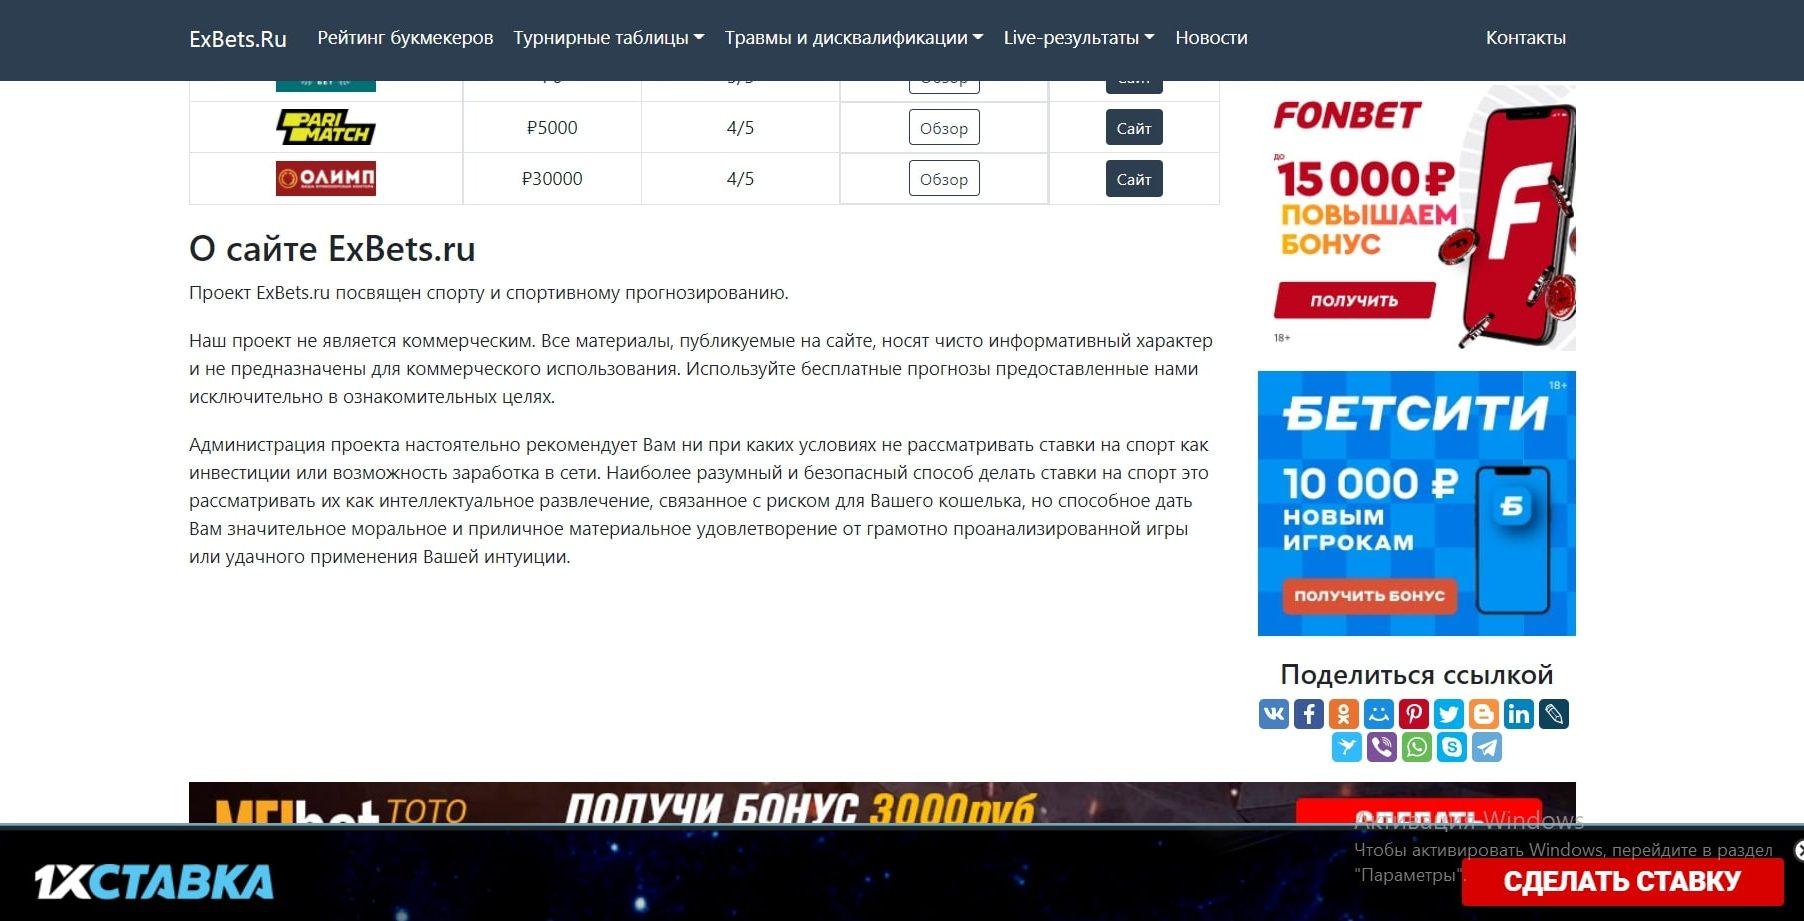 О сайте Exbets.ru